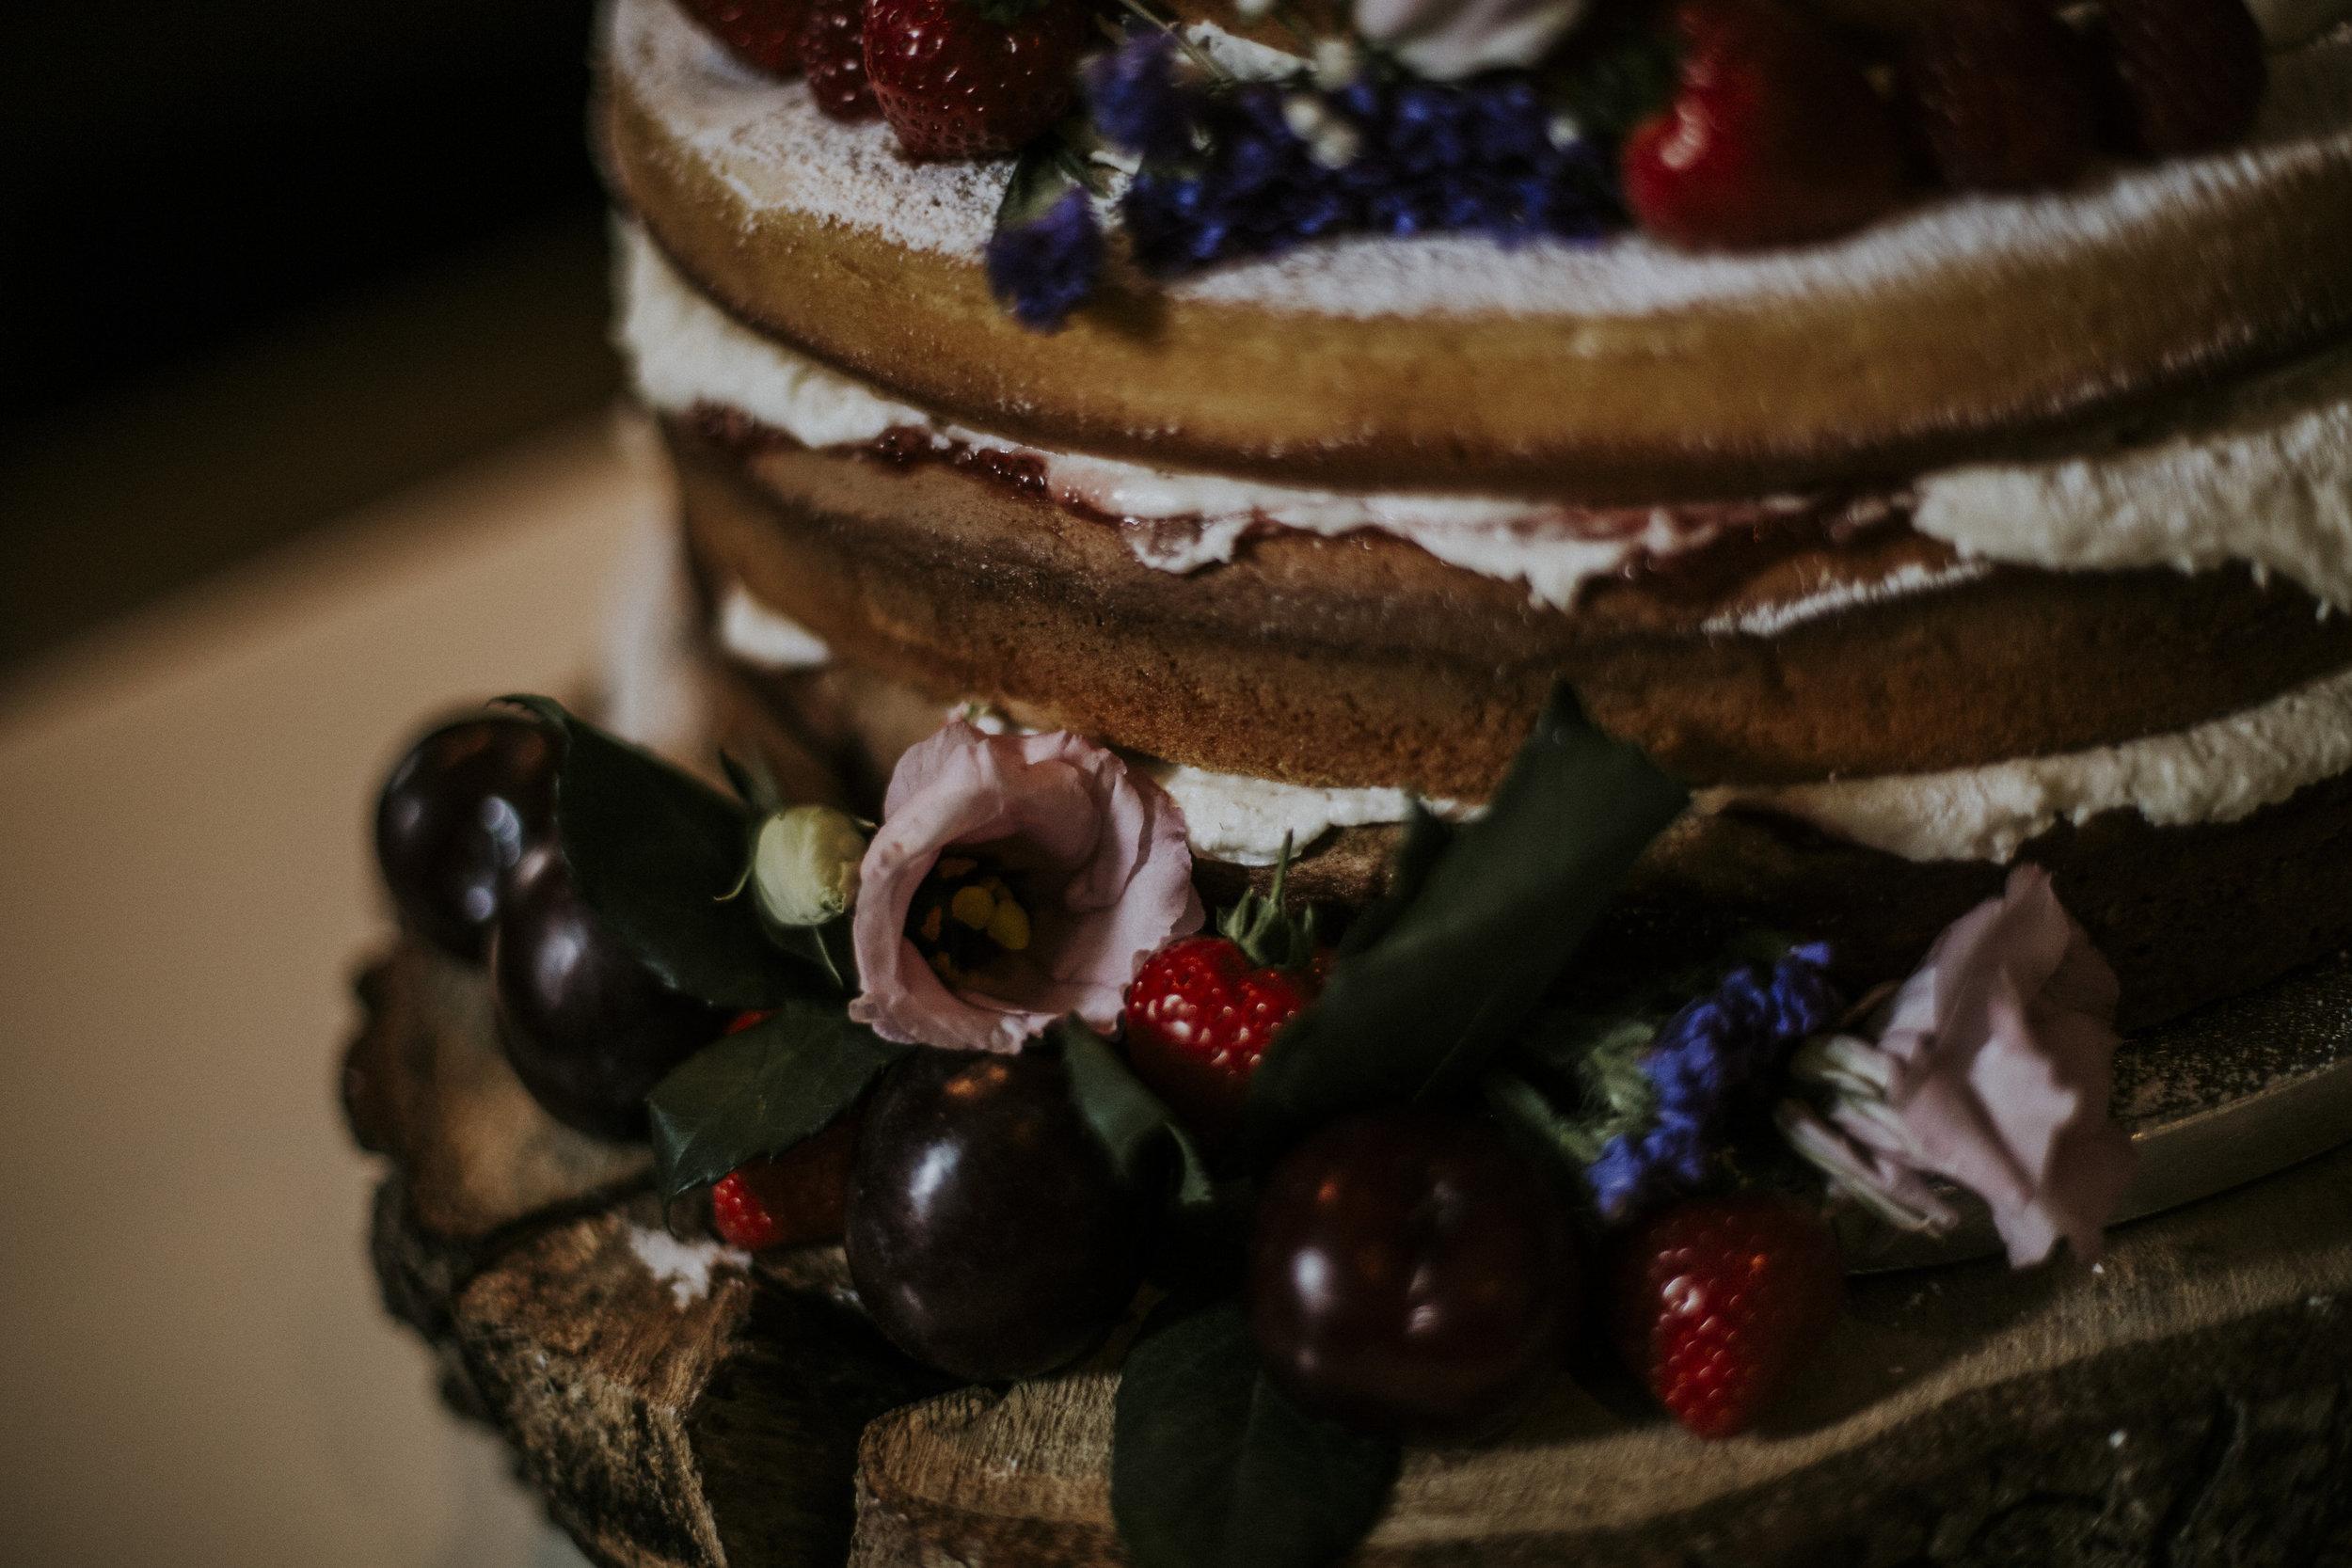 021_wedding_cake_glasgow.jpg